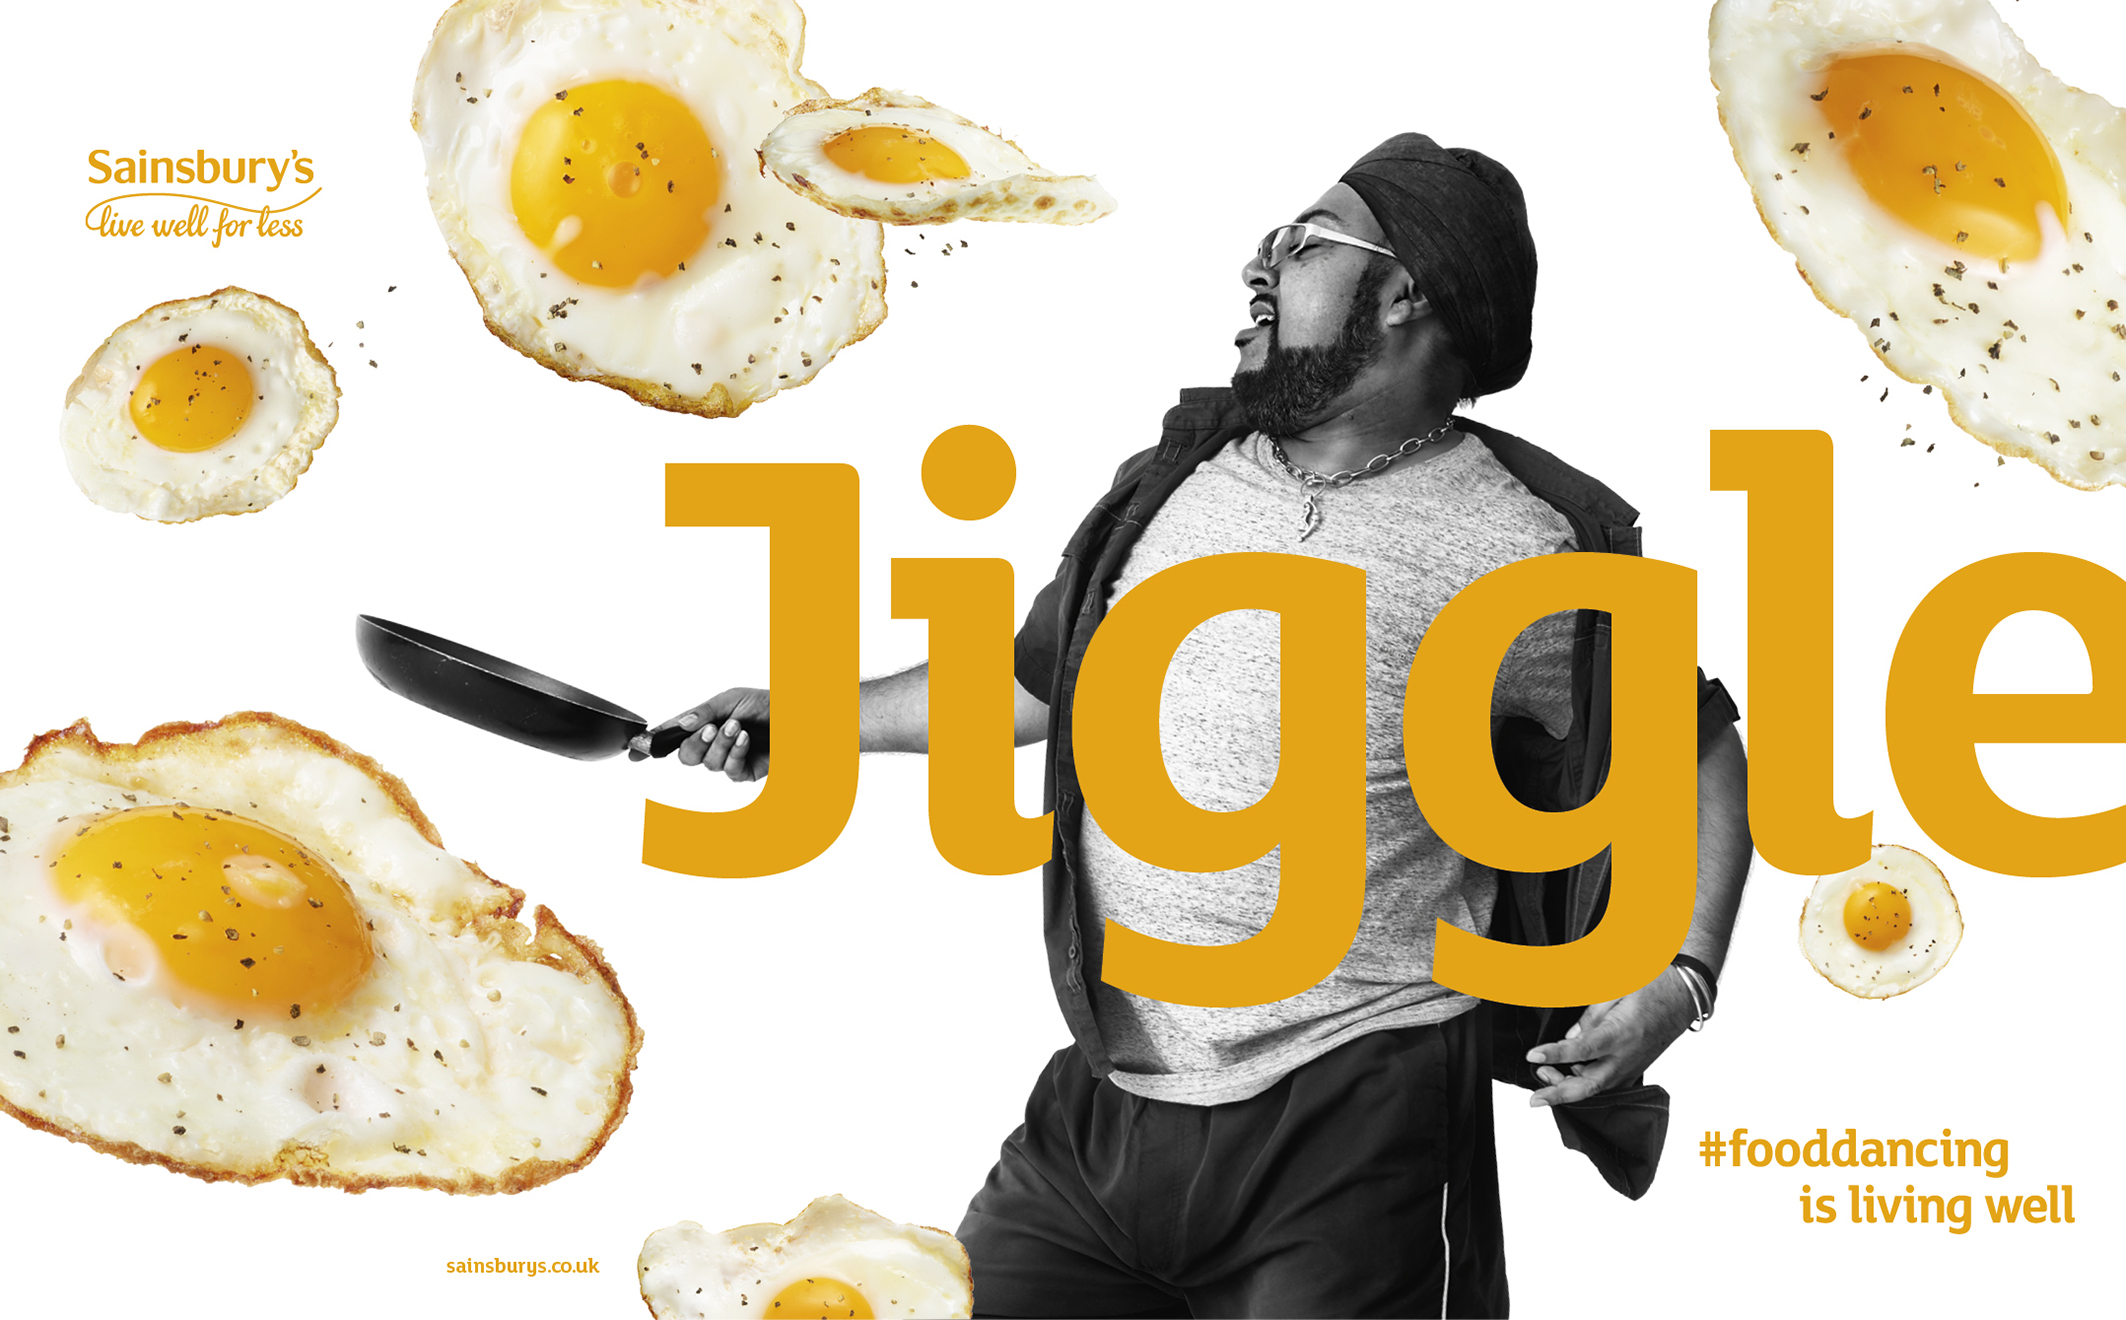 SAI01P16013_Food_dancing_BigCity_TheMirror_DPS_Jiggle_v03.jpg